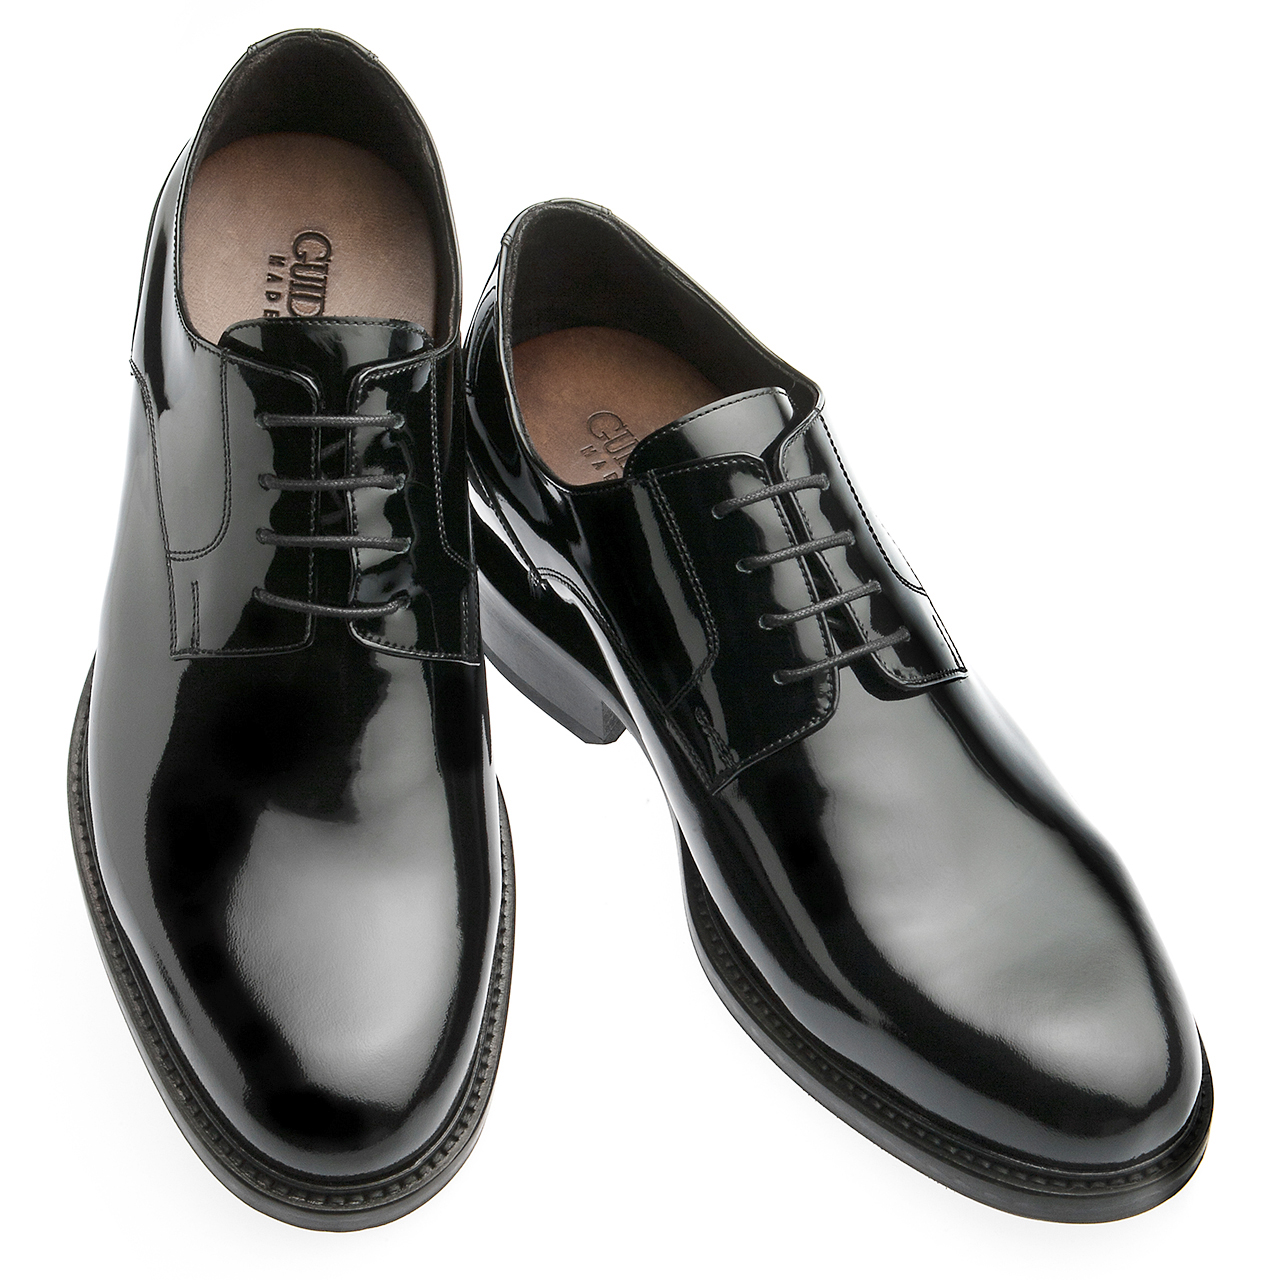 Scarpe Da Matrimonio Uomo Sportive : Scarpe uomo matrimonio prada scarpa sport